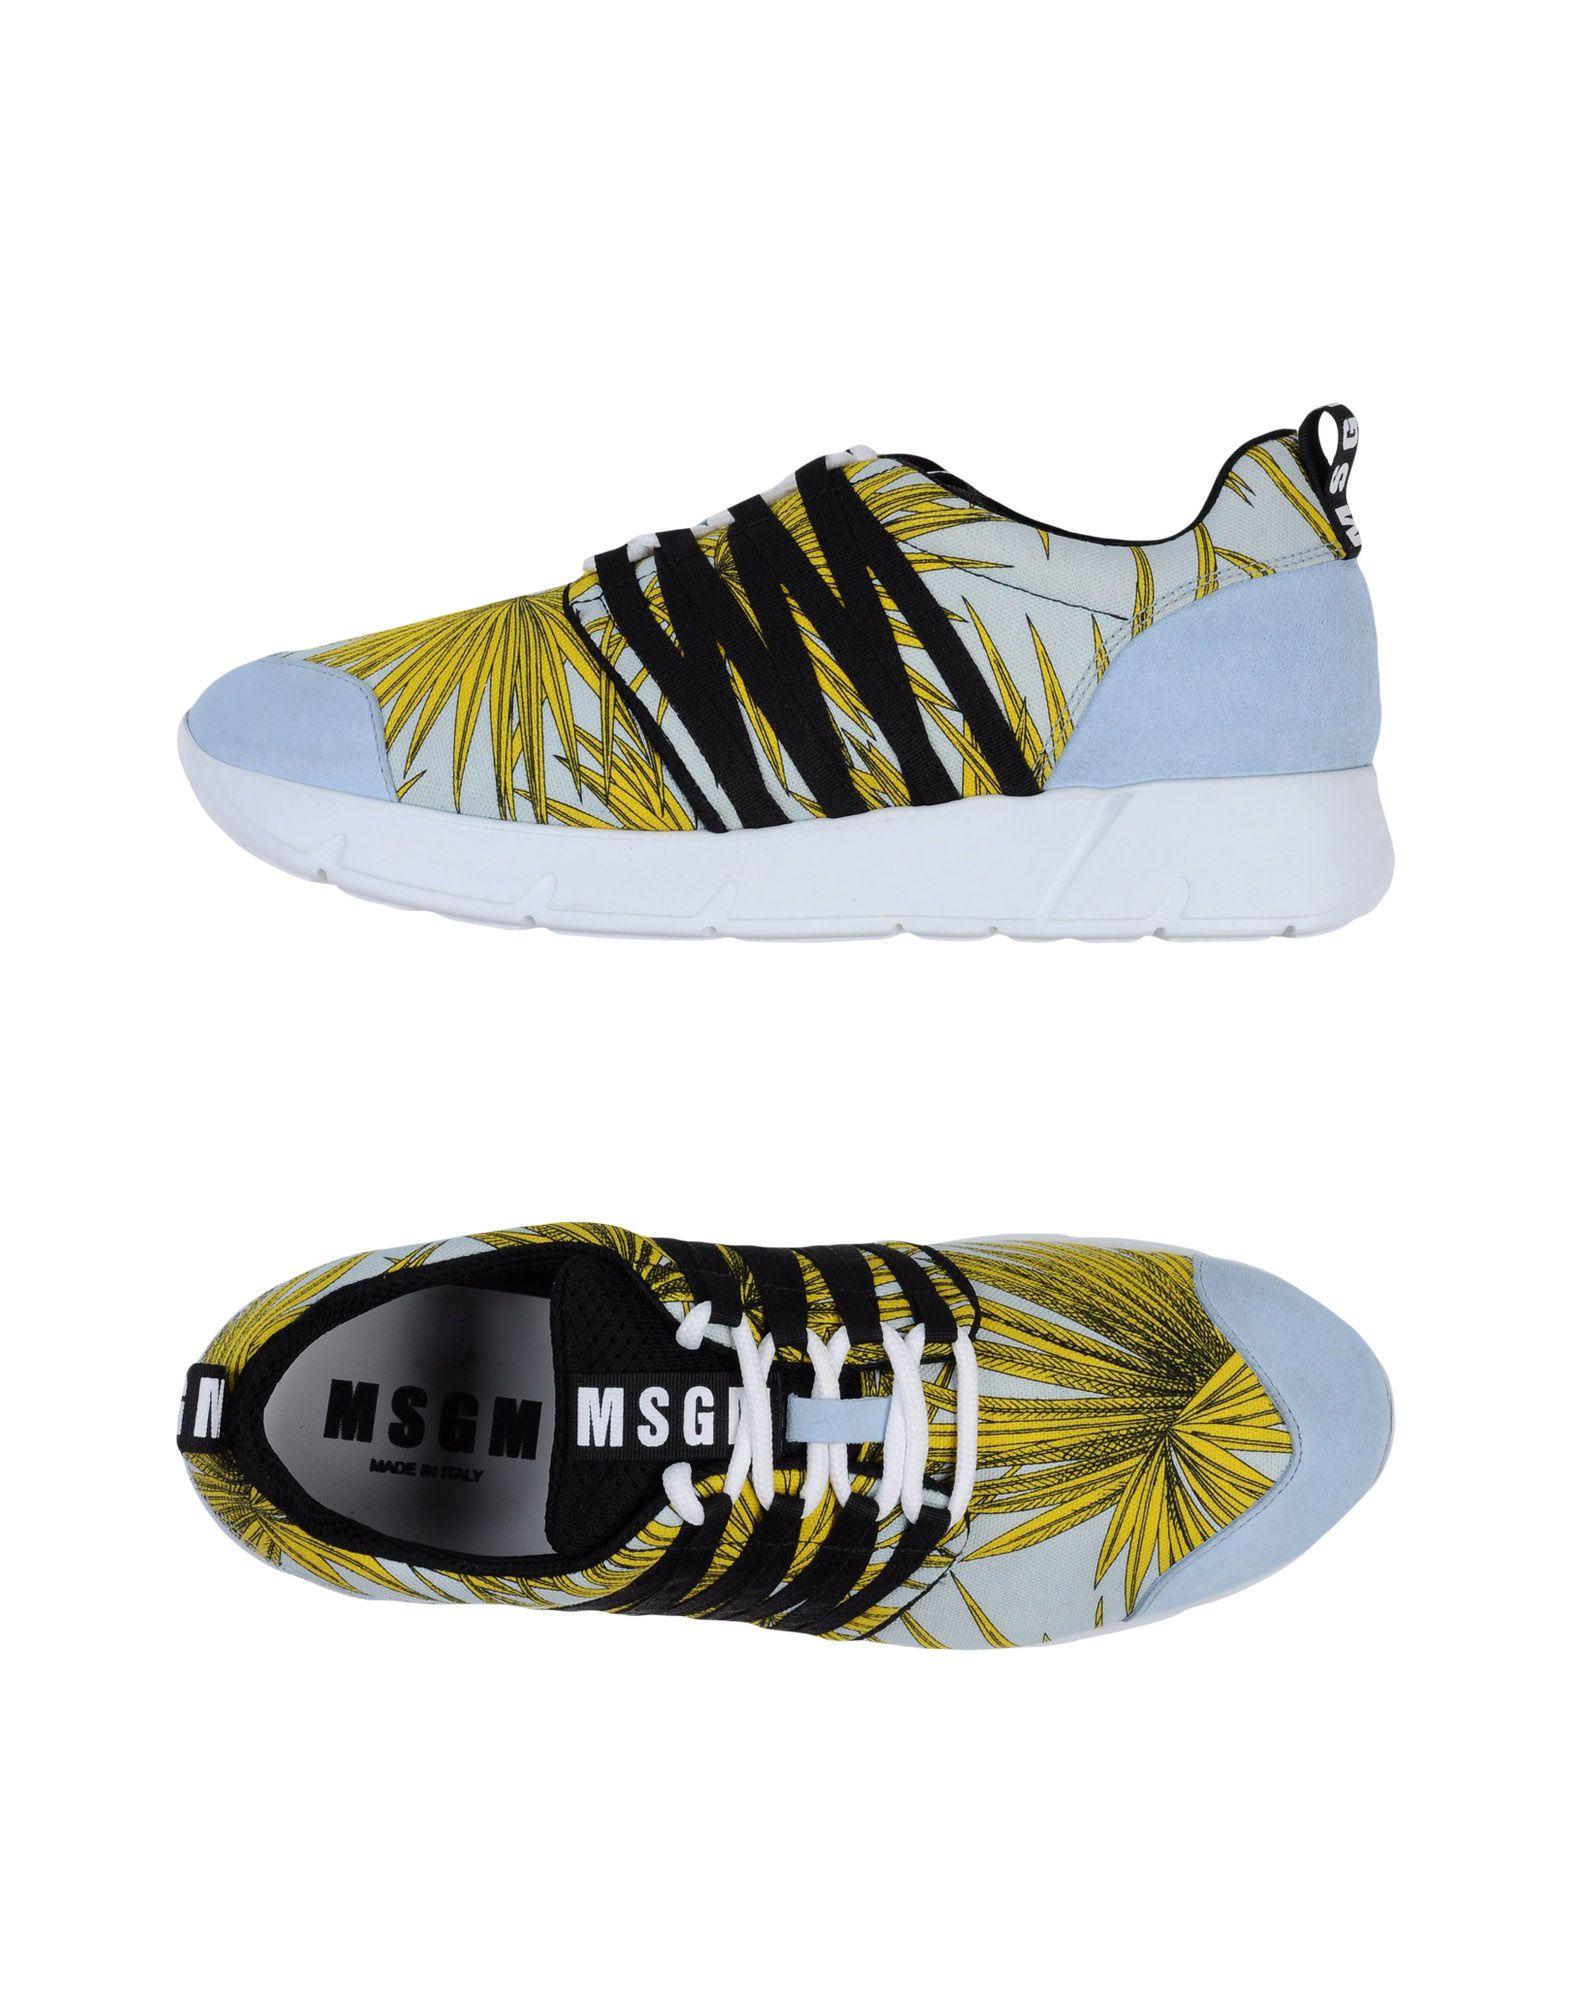 Msgm Sneakers Damen  11129175WQGut aussehende strapazierfähige Schuhe